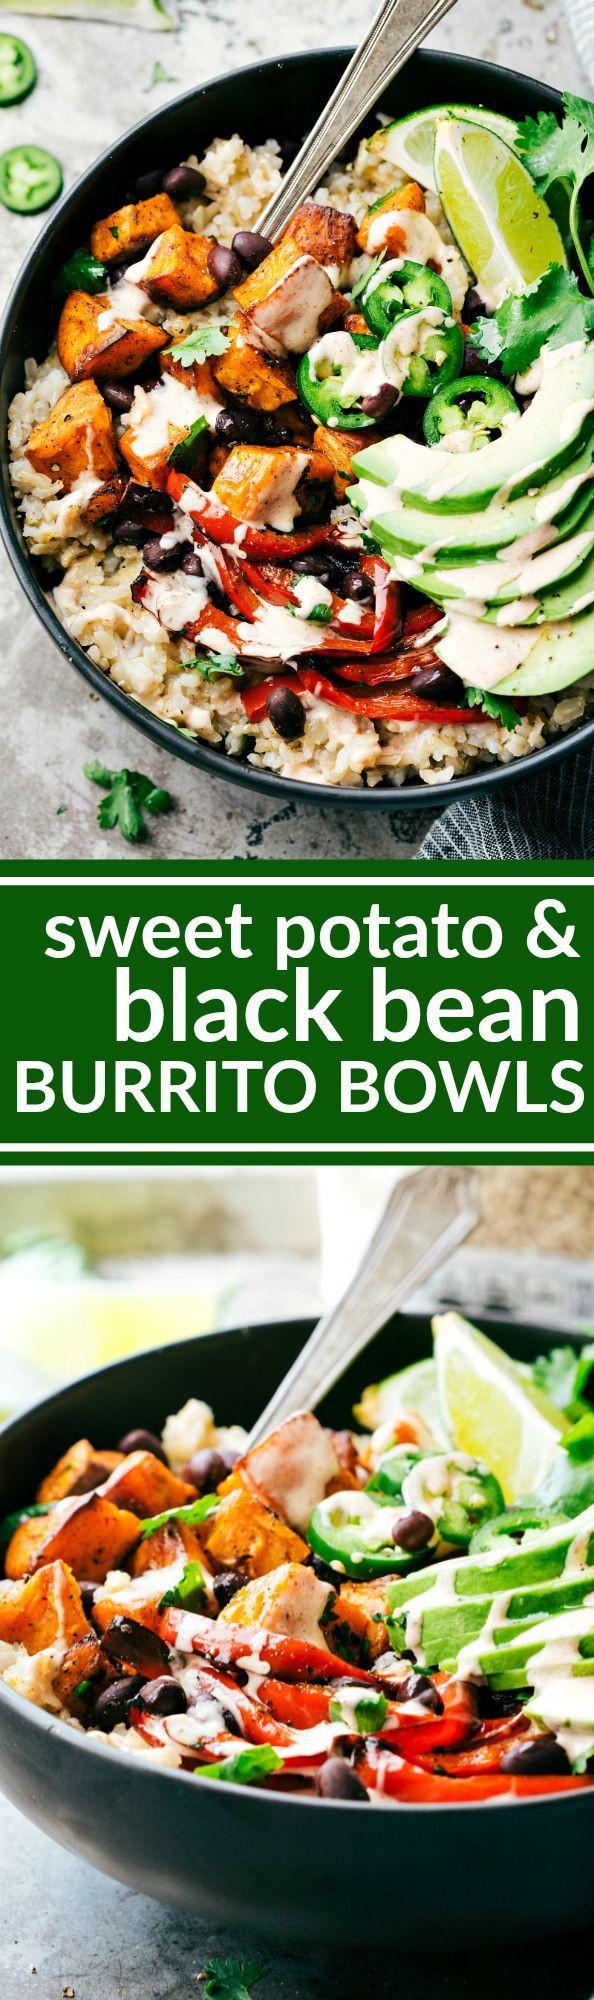 Sweet Potato Black Bean  Easy Sweet Potato & Black Bean Burrito Bowls Recipe